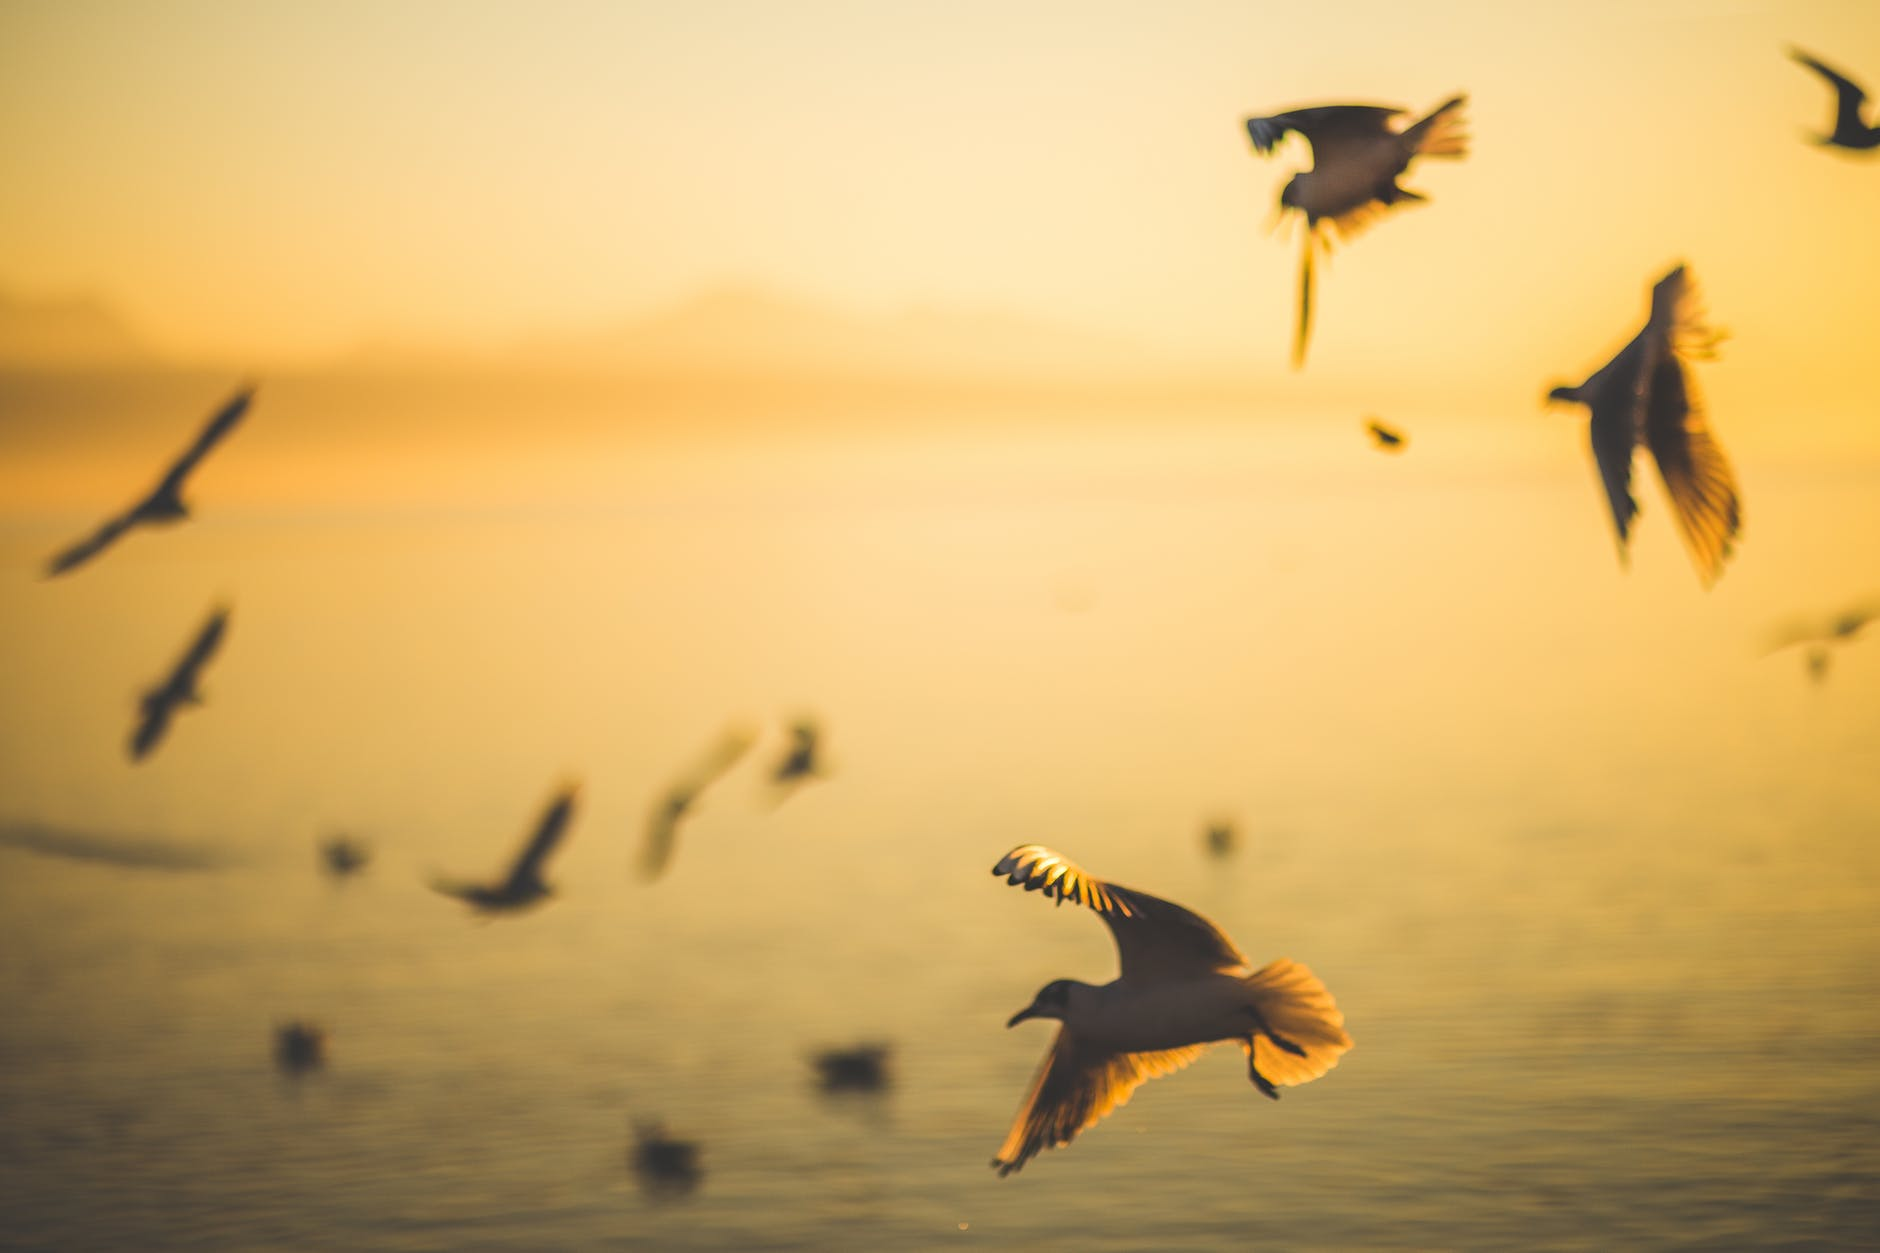 white seagul